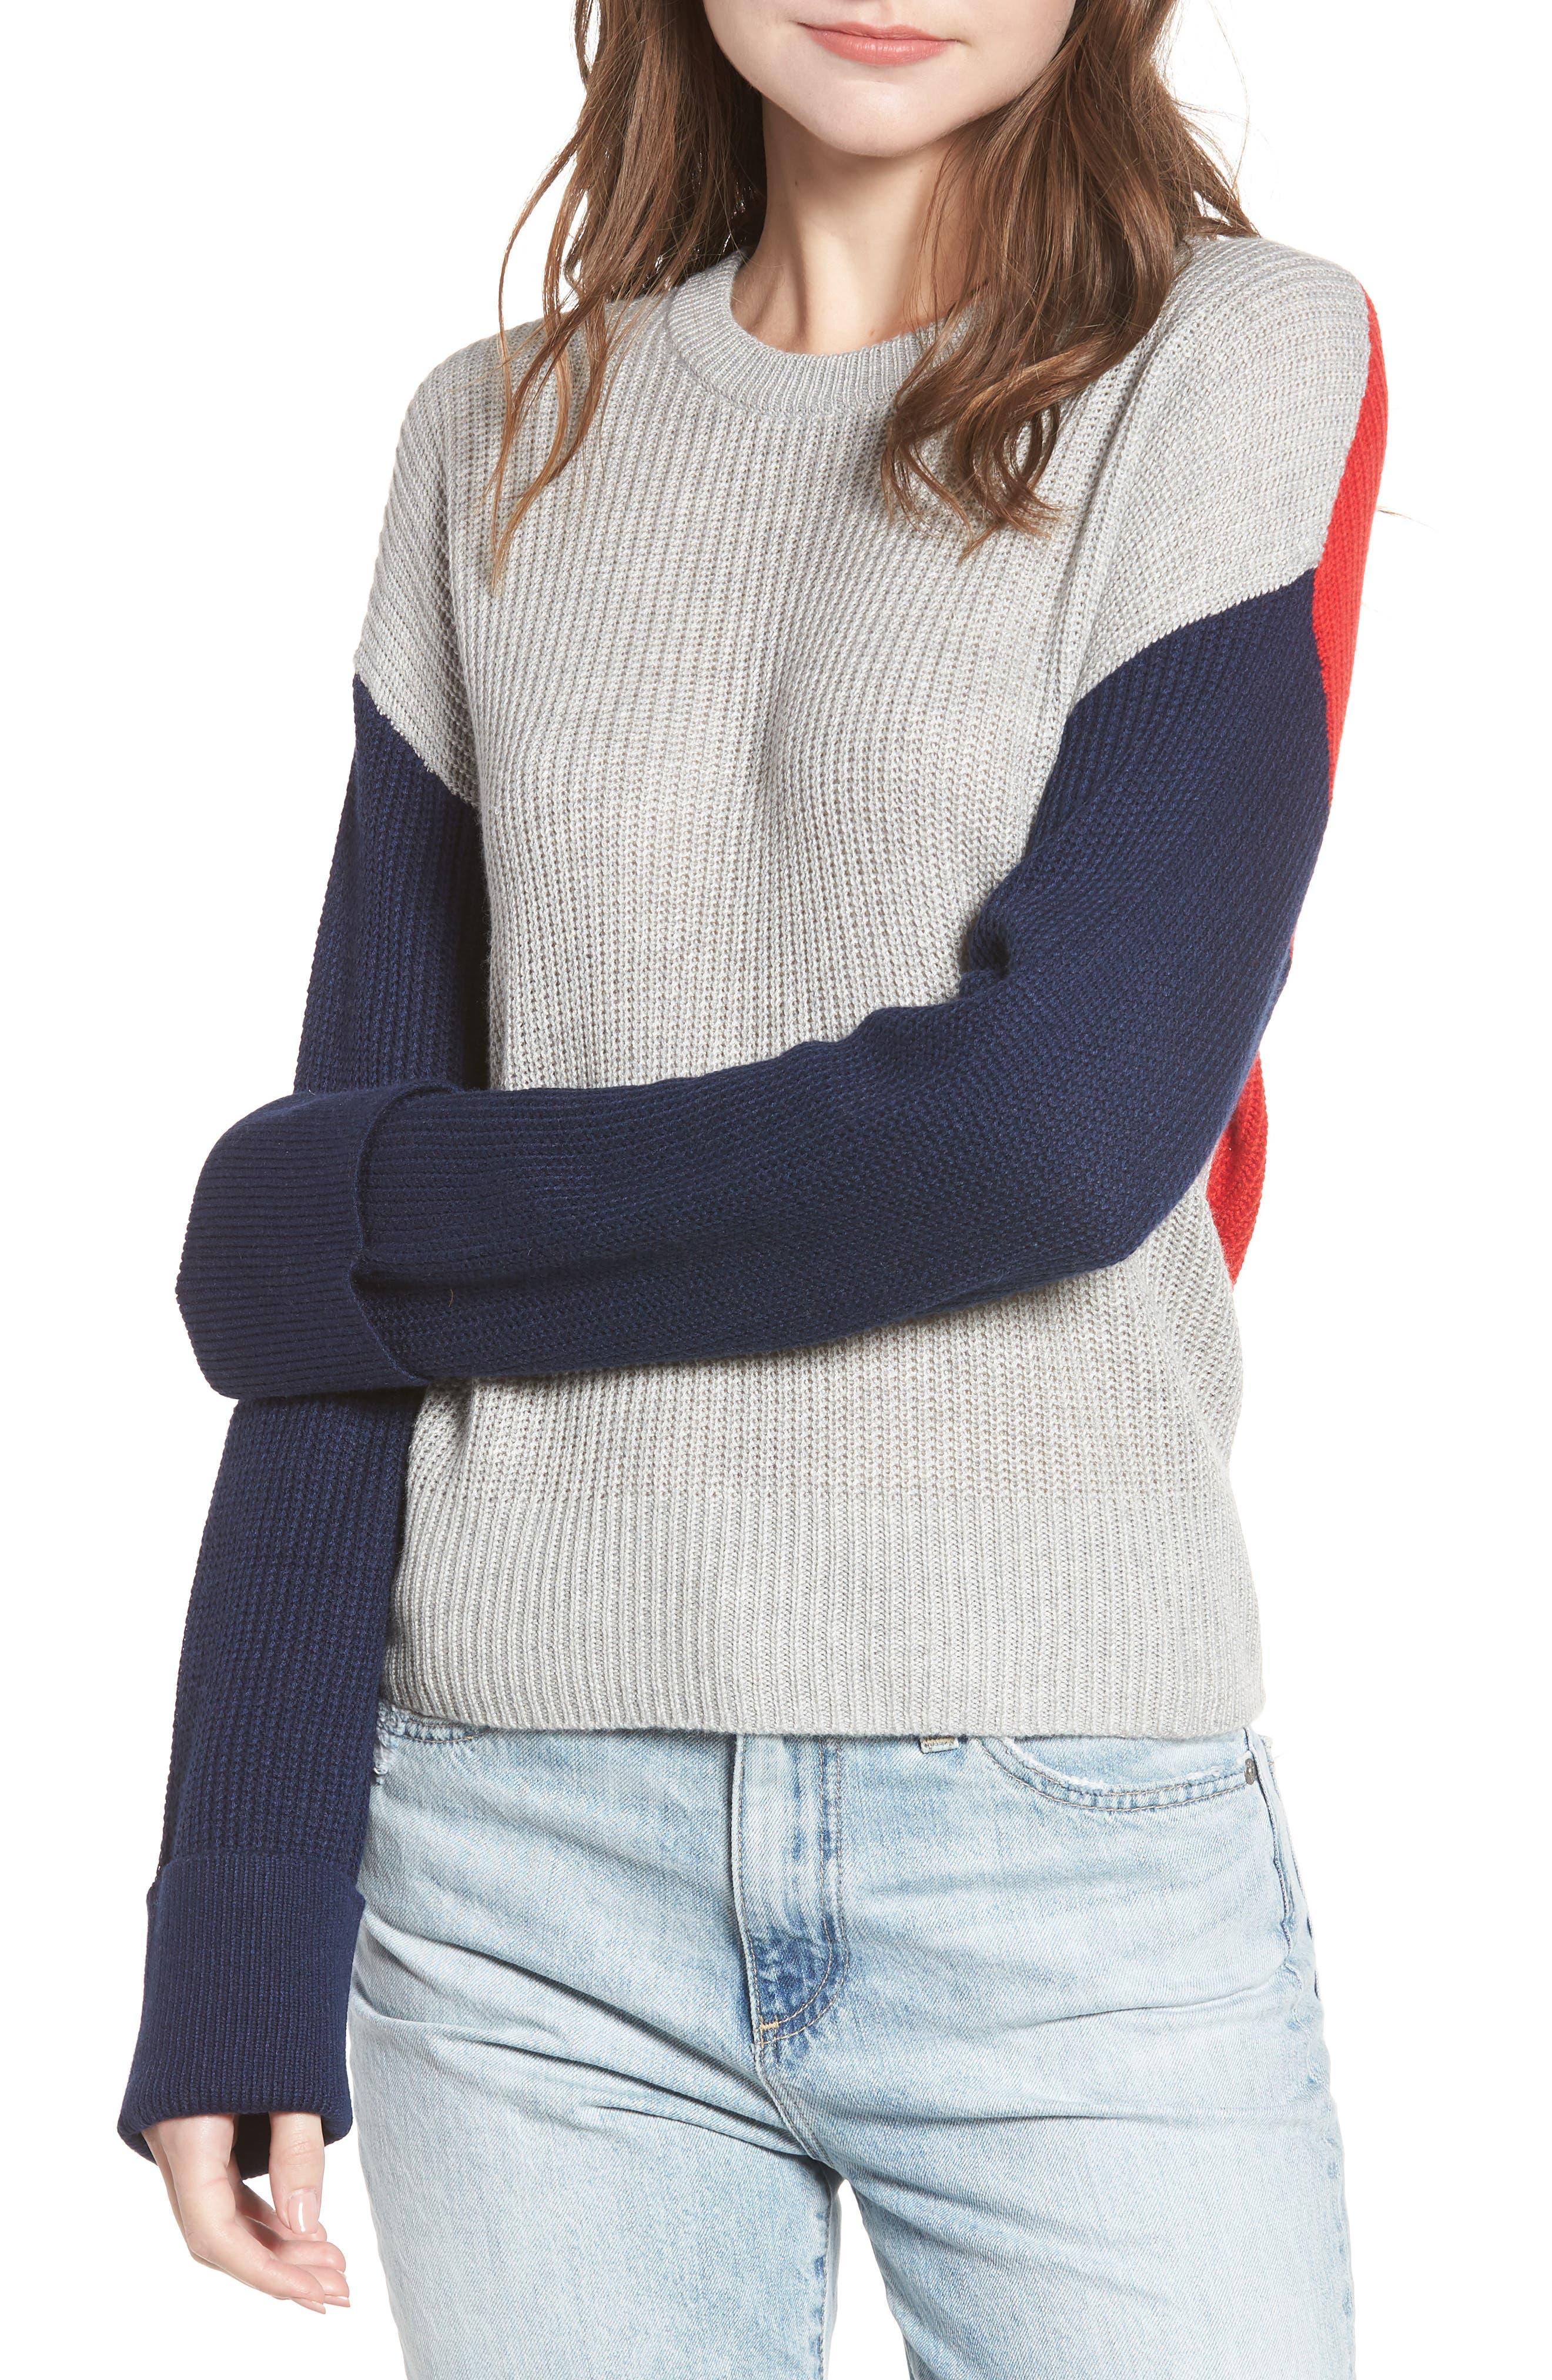 Colorblock Sweater,                             Main thumbnail 1, color,                             GREY/ NAVY